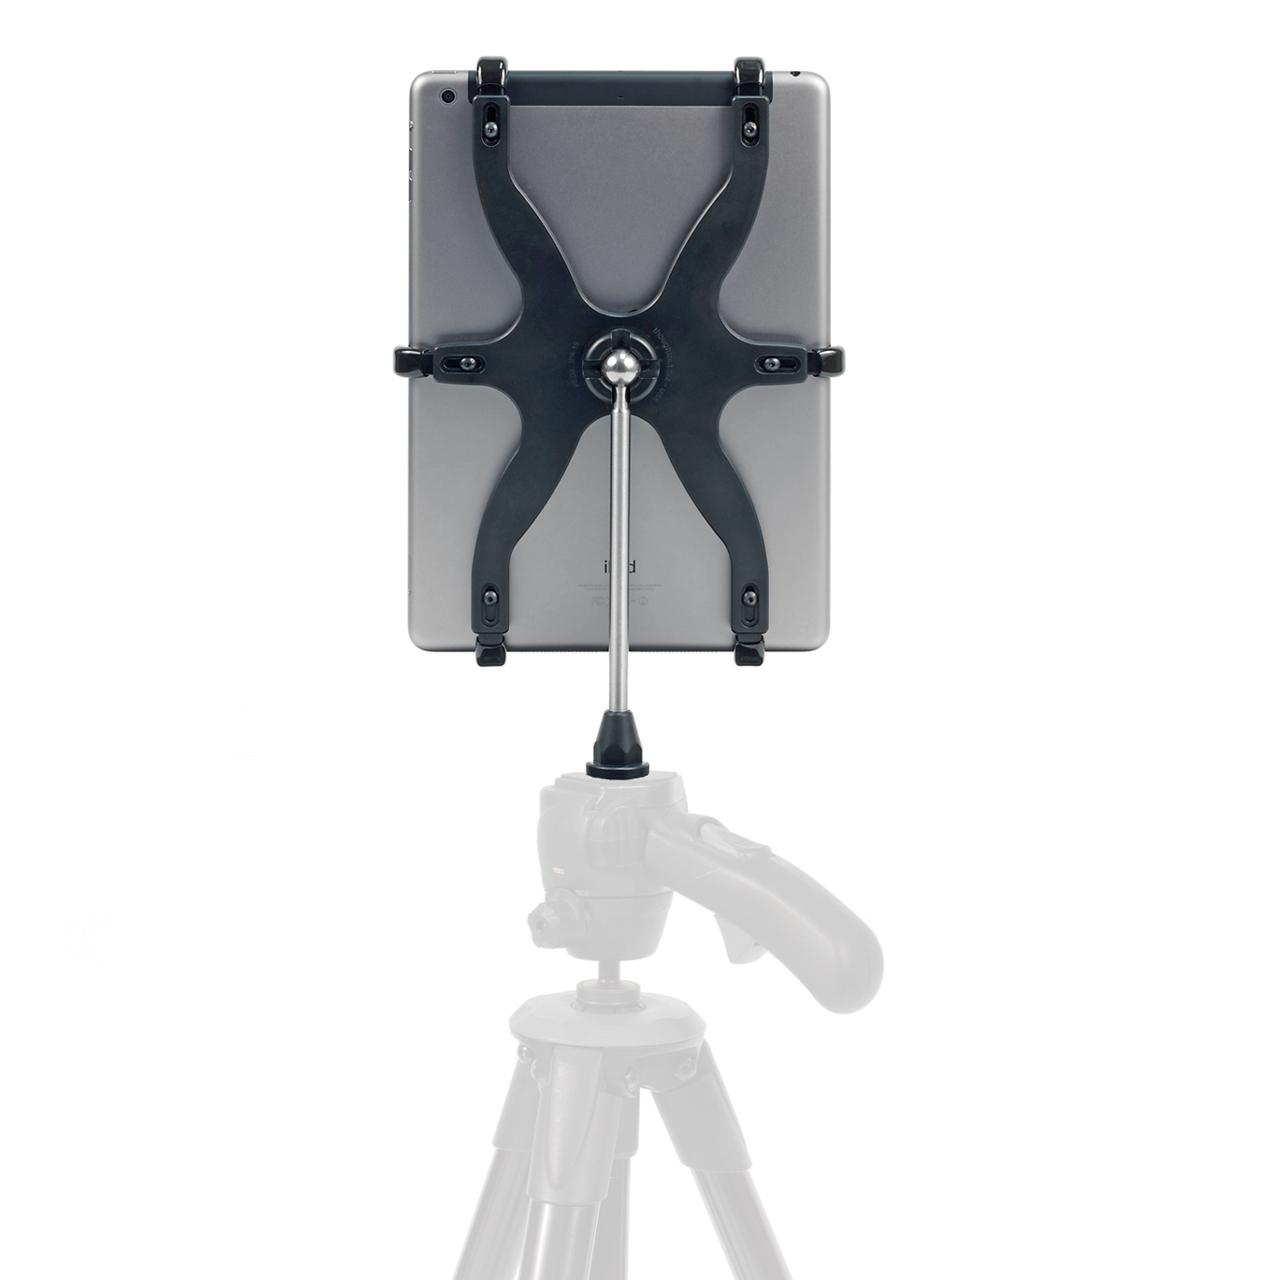 Converts to an iPad tripod mount